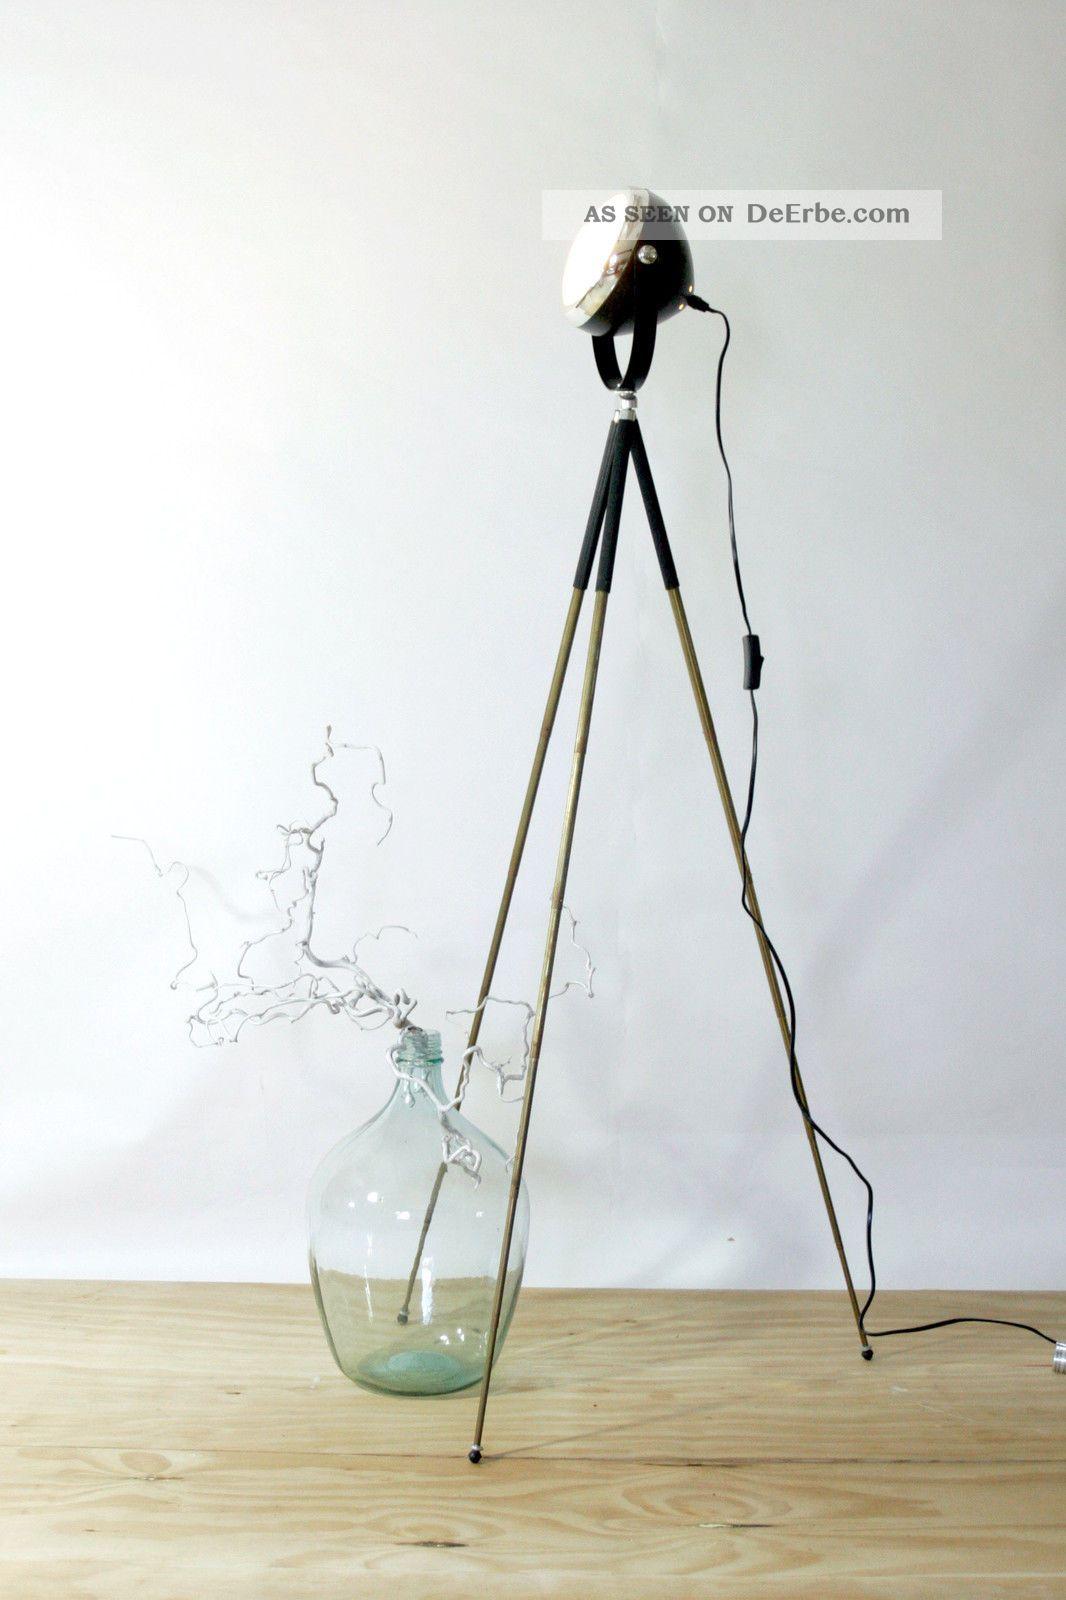 industrie design stehlampe tripod scheinwerfer fabriklampe. Black Bedroom Furniture Sets. Home Design Ideas